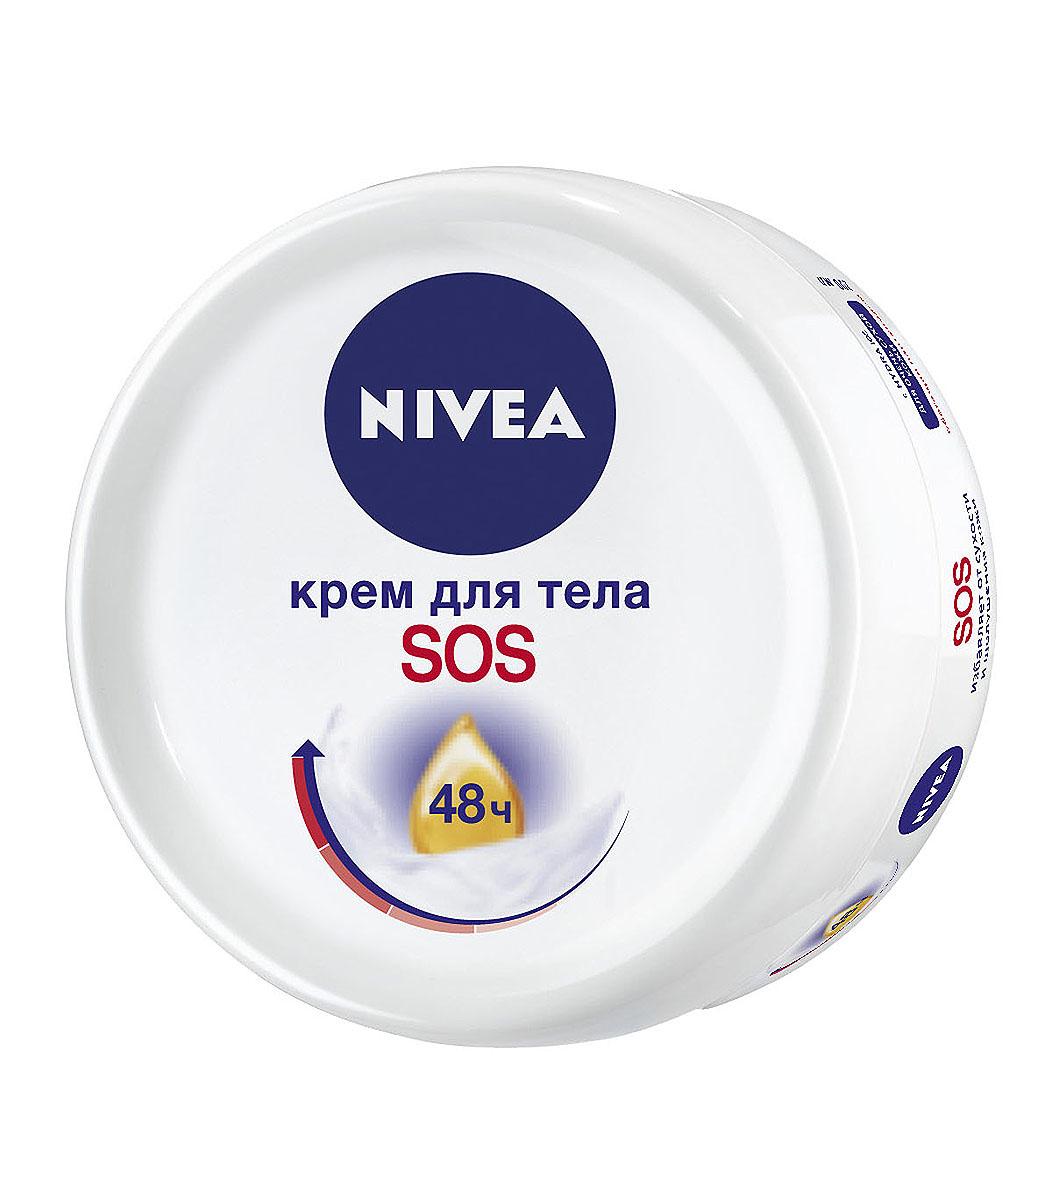 NIVEA SOS-крем для тела 200 мл topicrem sos крем для тела восстанавливающий 200 мл